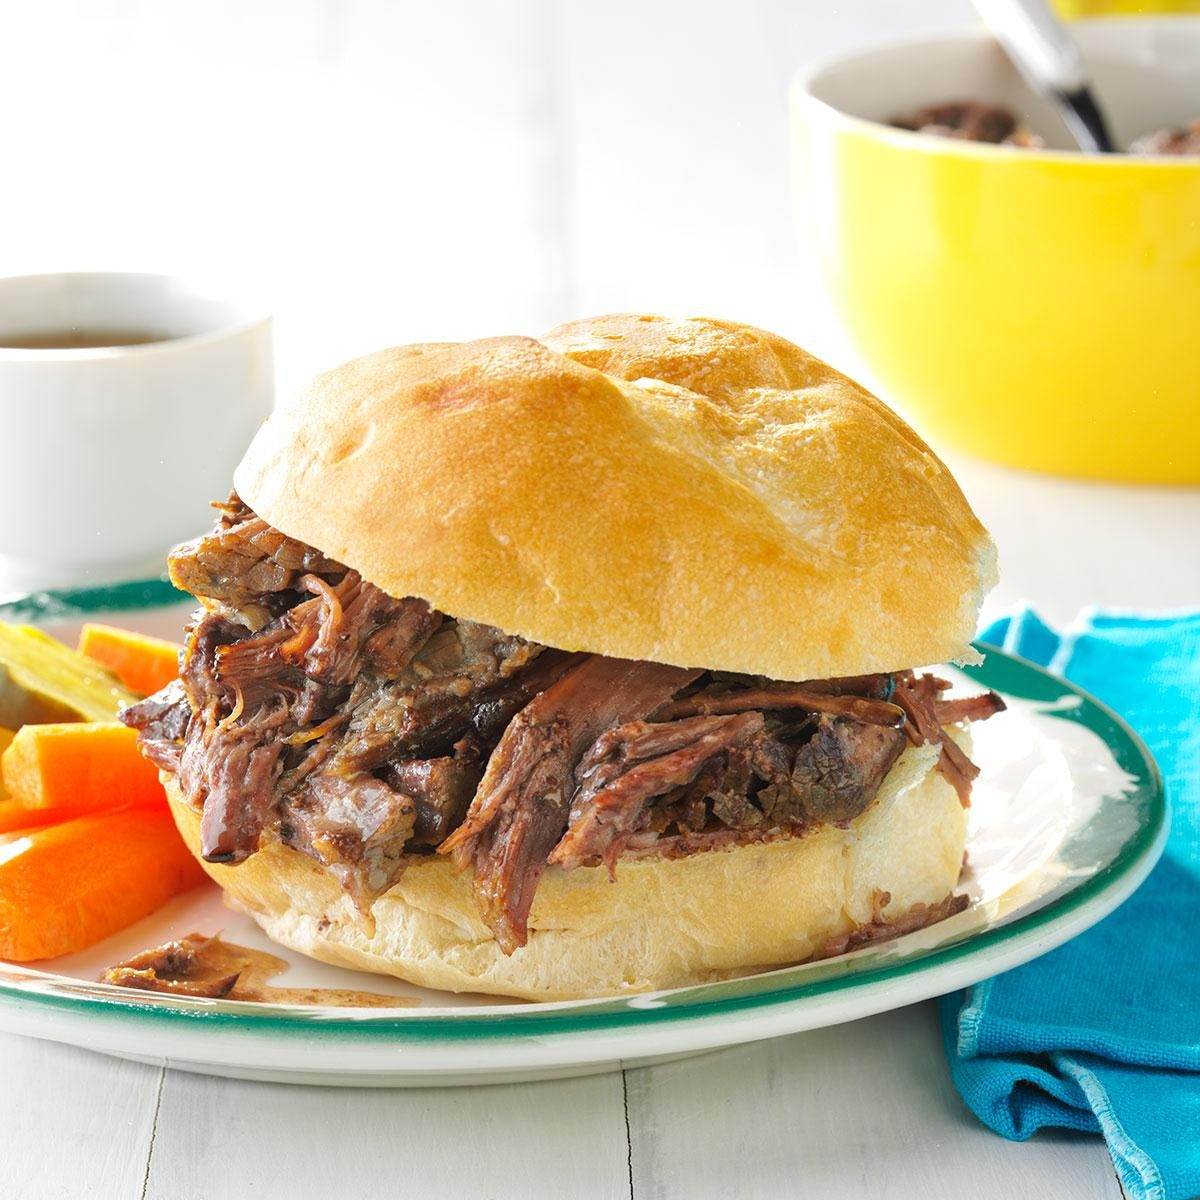 31: Shredded Beef au Jus